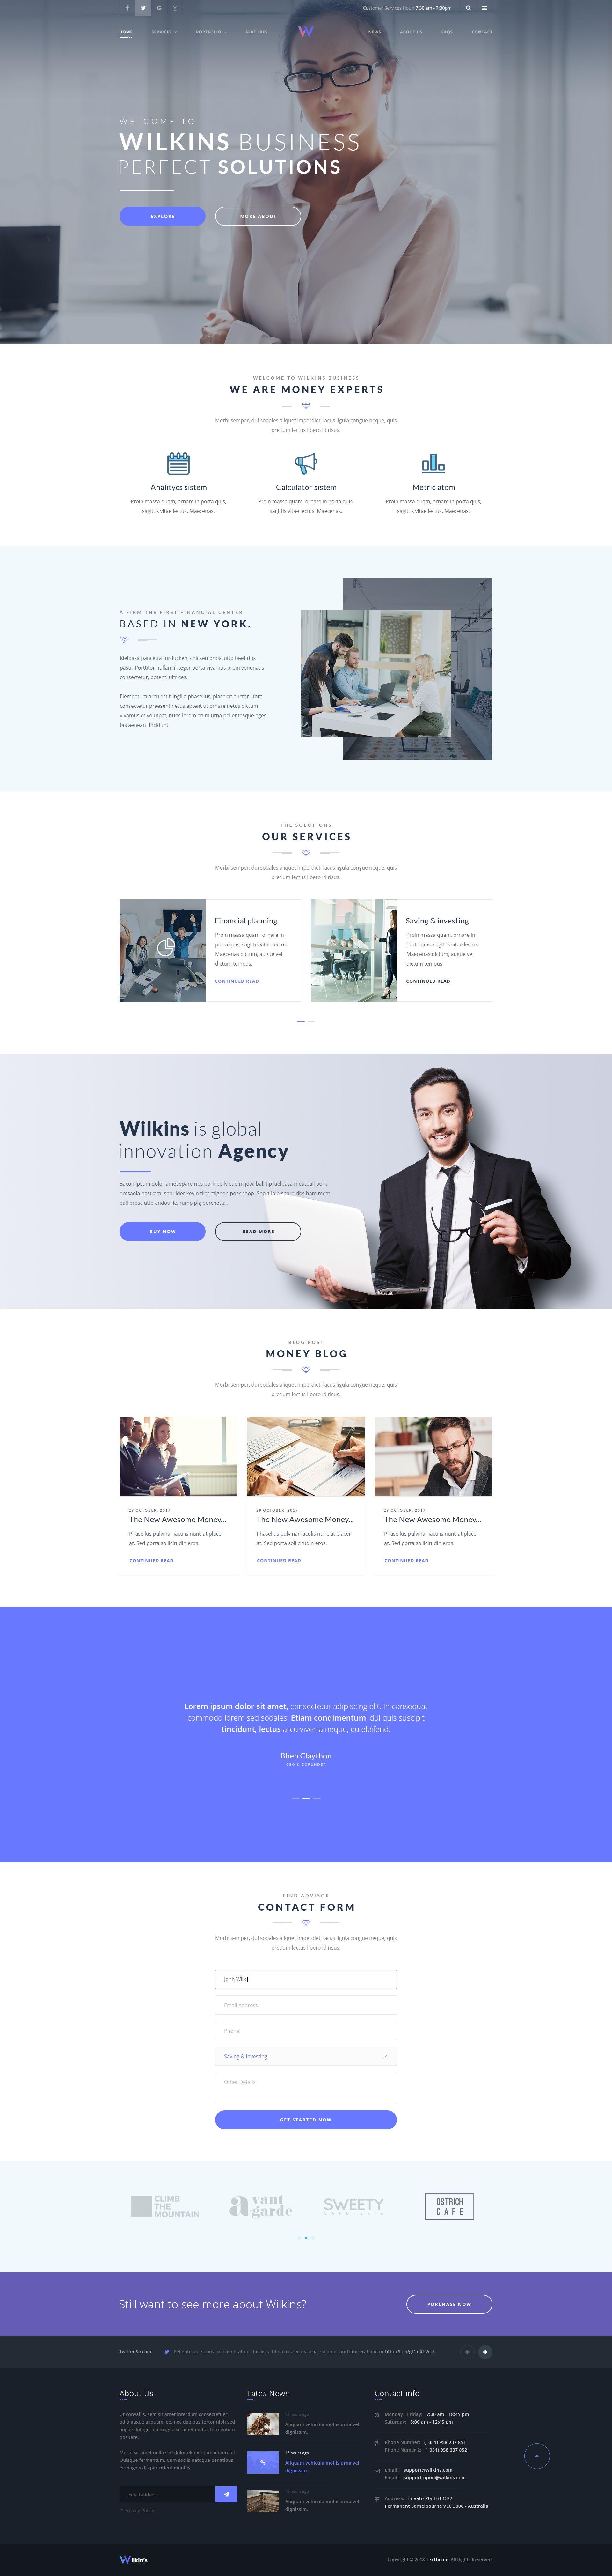 Juro Marketing Site Marketing Sites Business Advertising Design Design